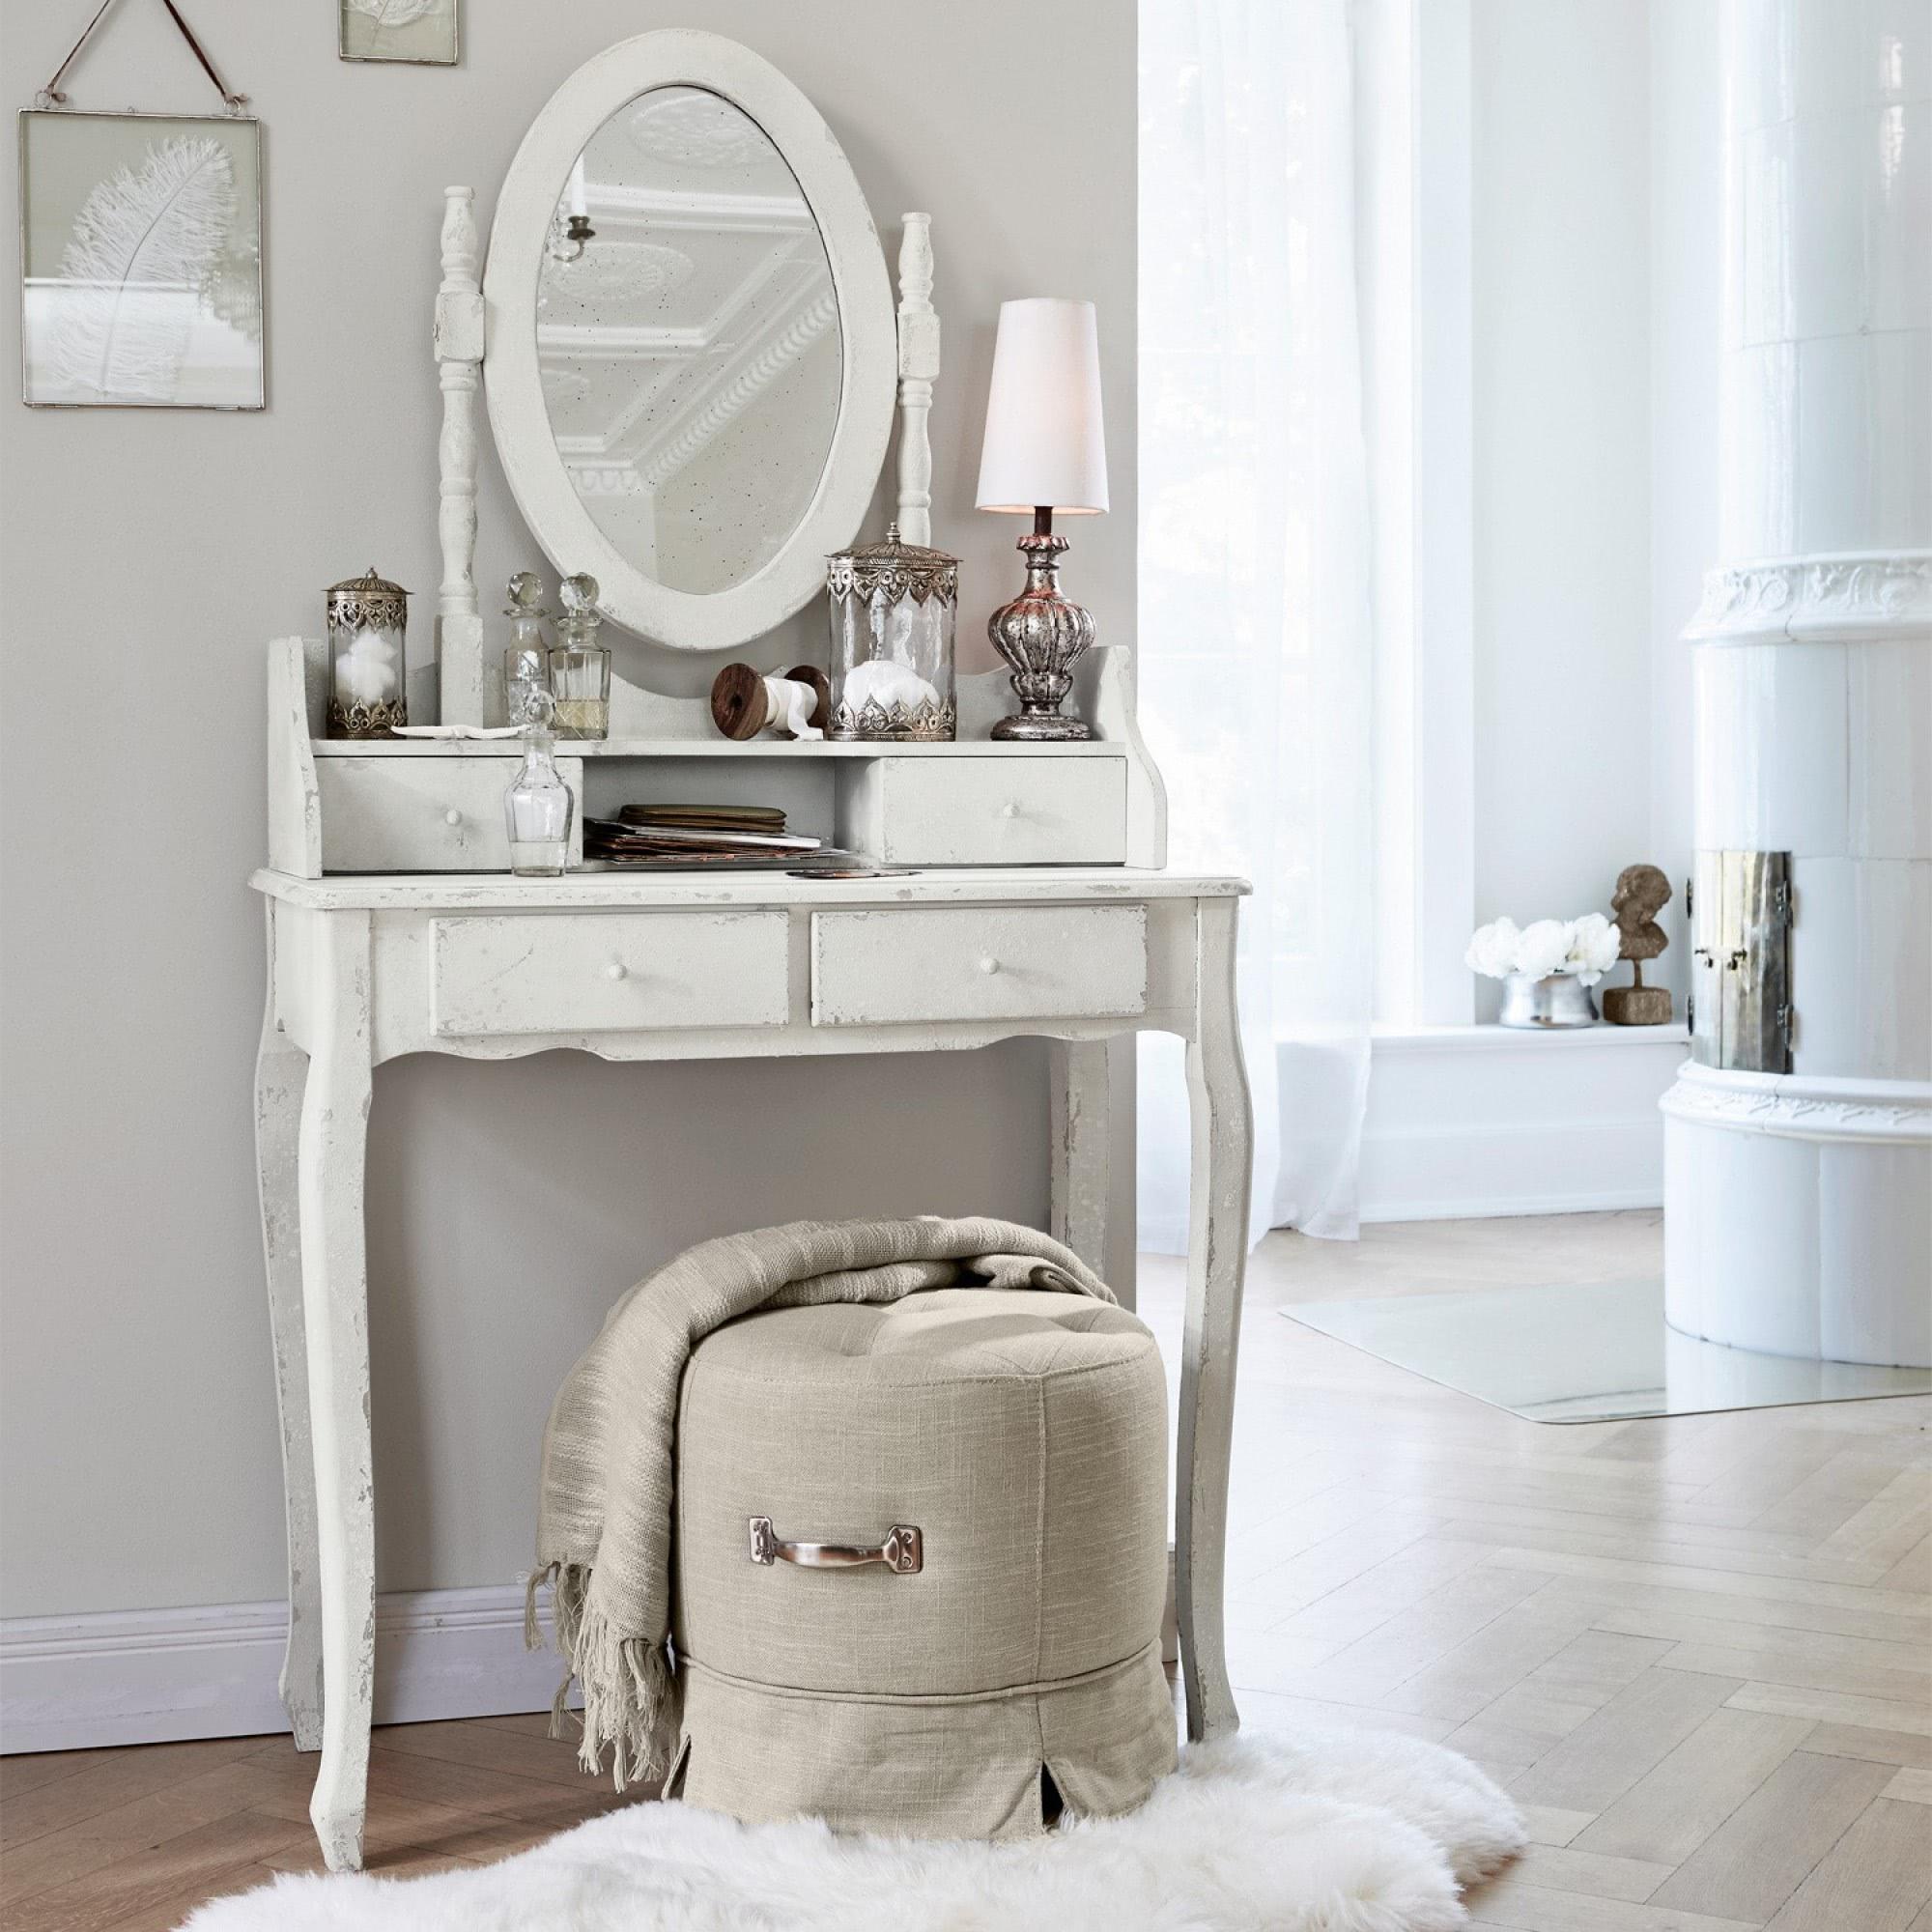 schminktisch vidette loberon coming home. Black Bedroom Furniture Sets. Home Design Ideas